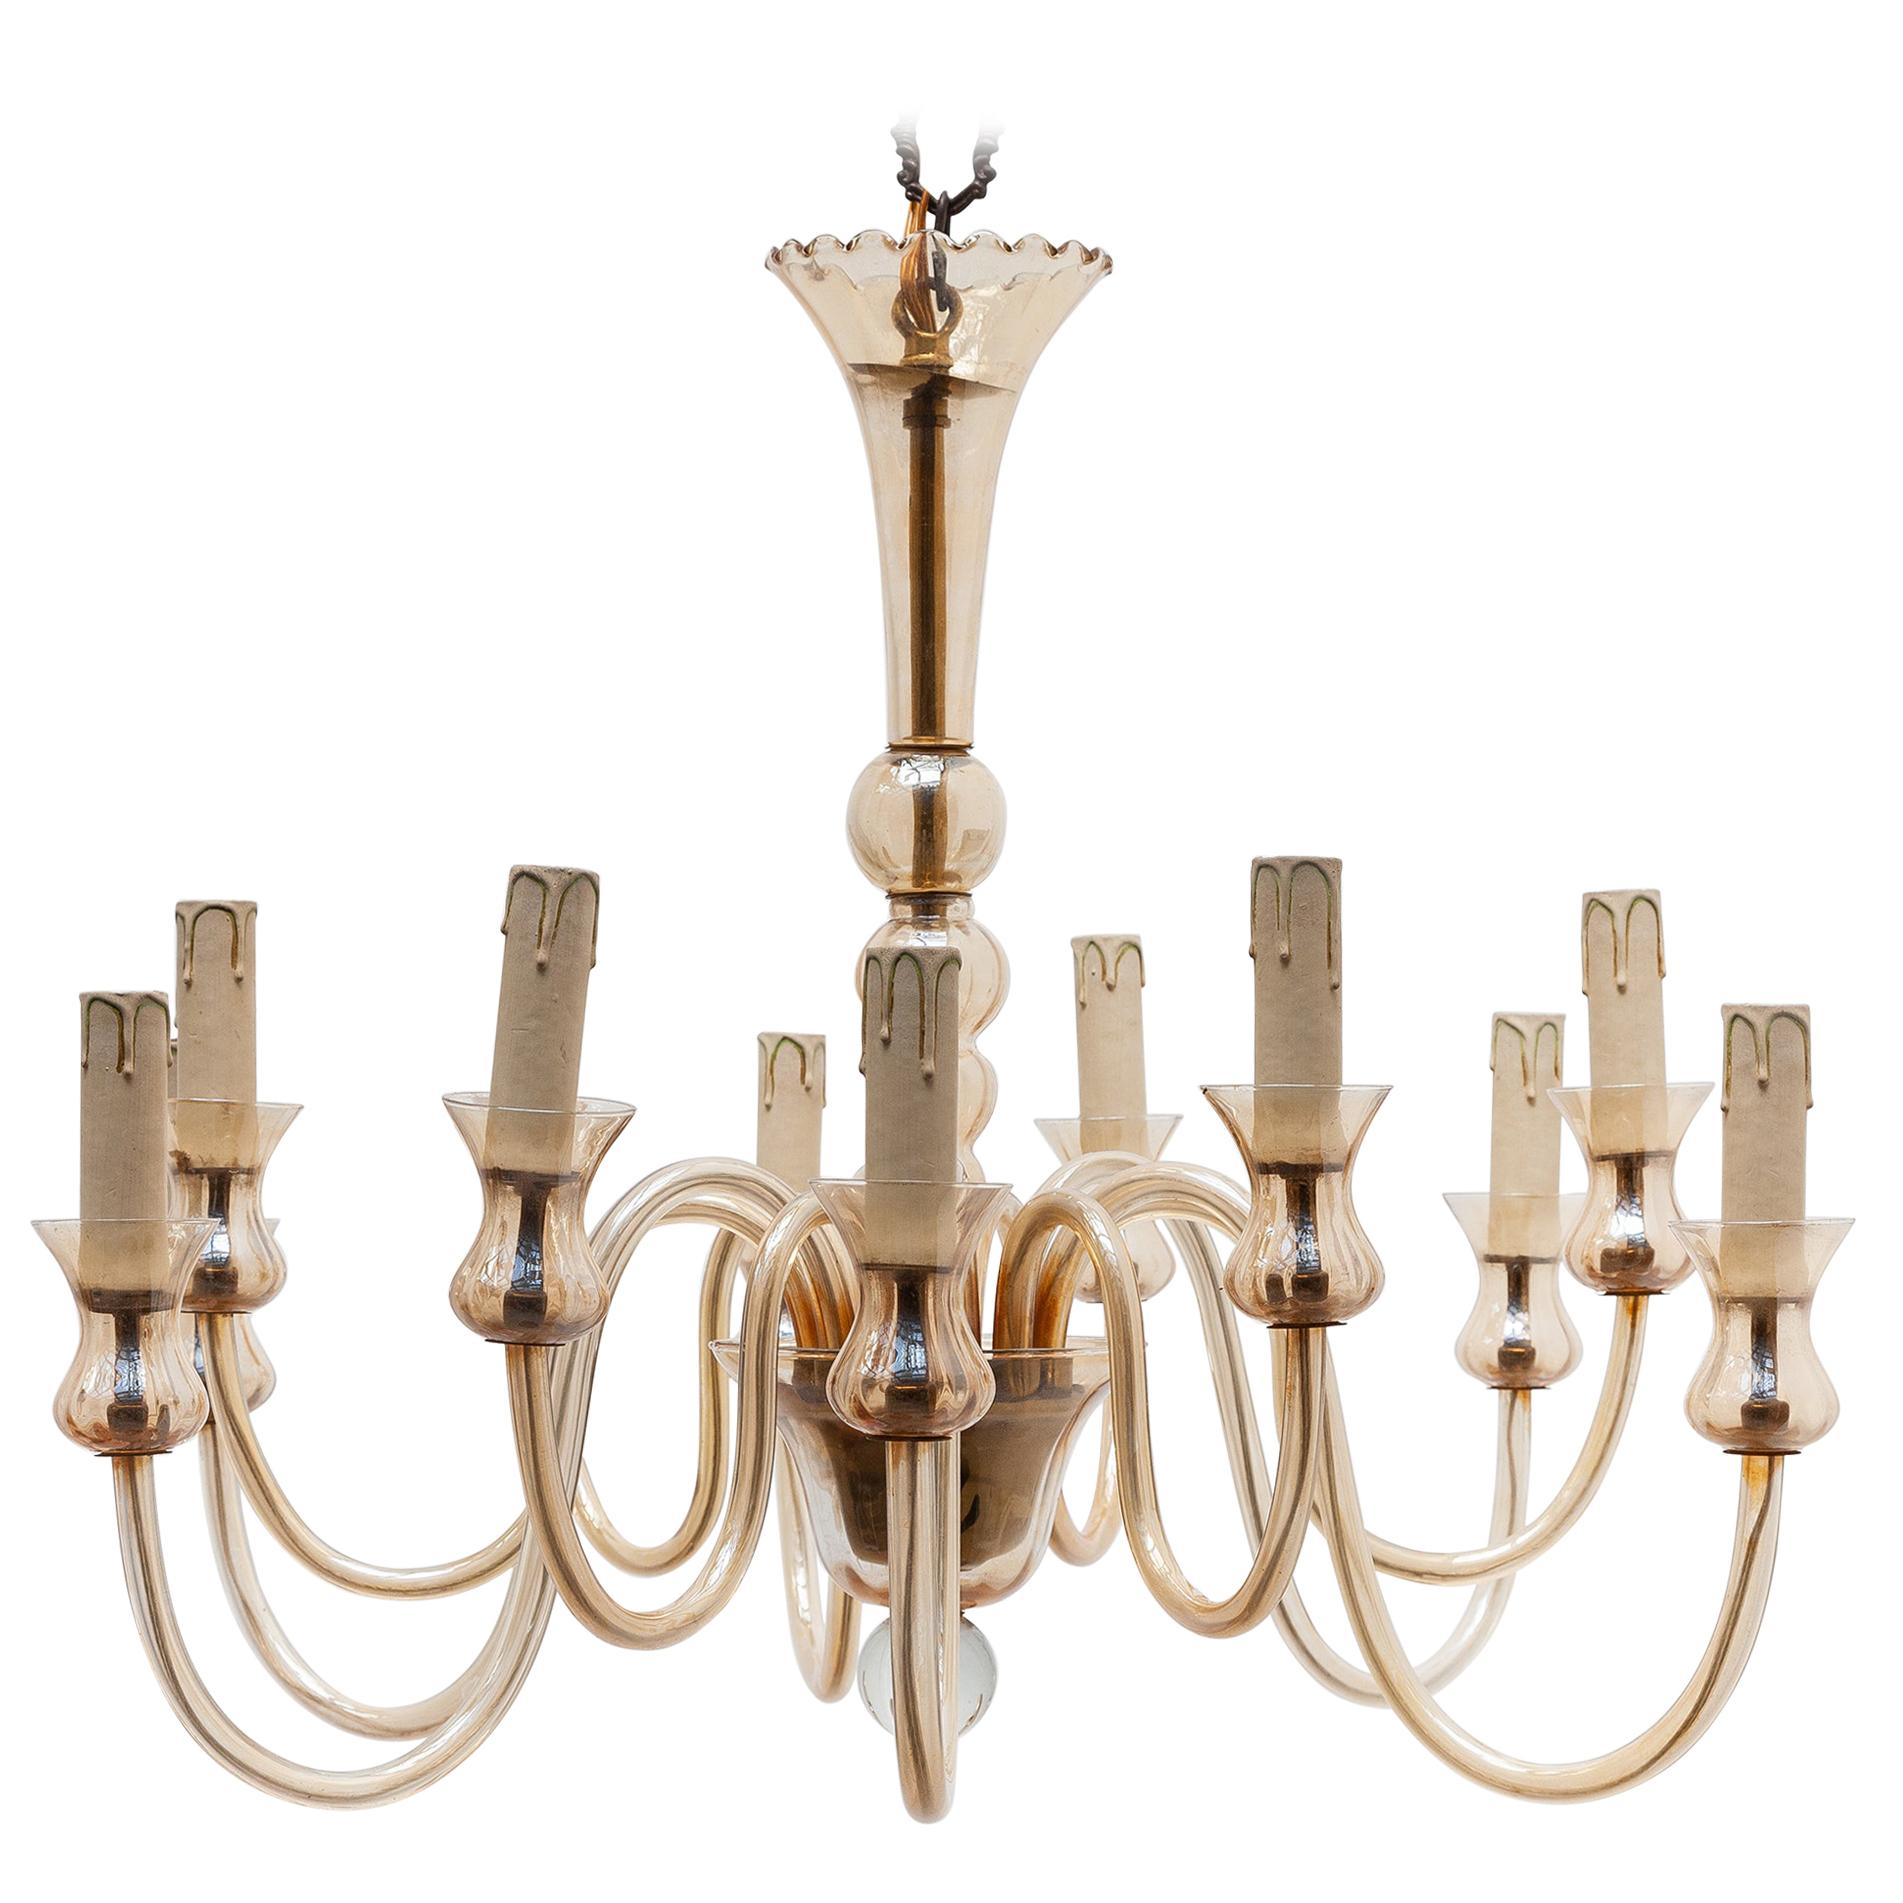 Hollywood Regency Venetian Glass Chandelier, Twelve Arms of Light